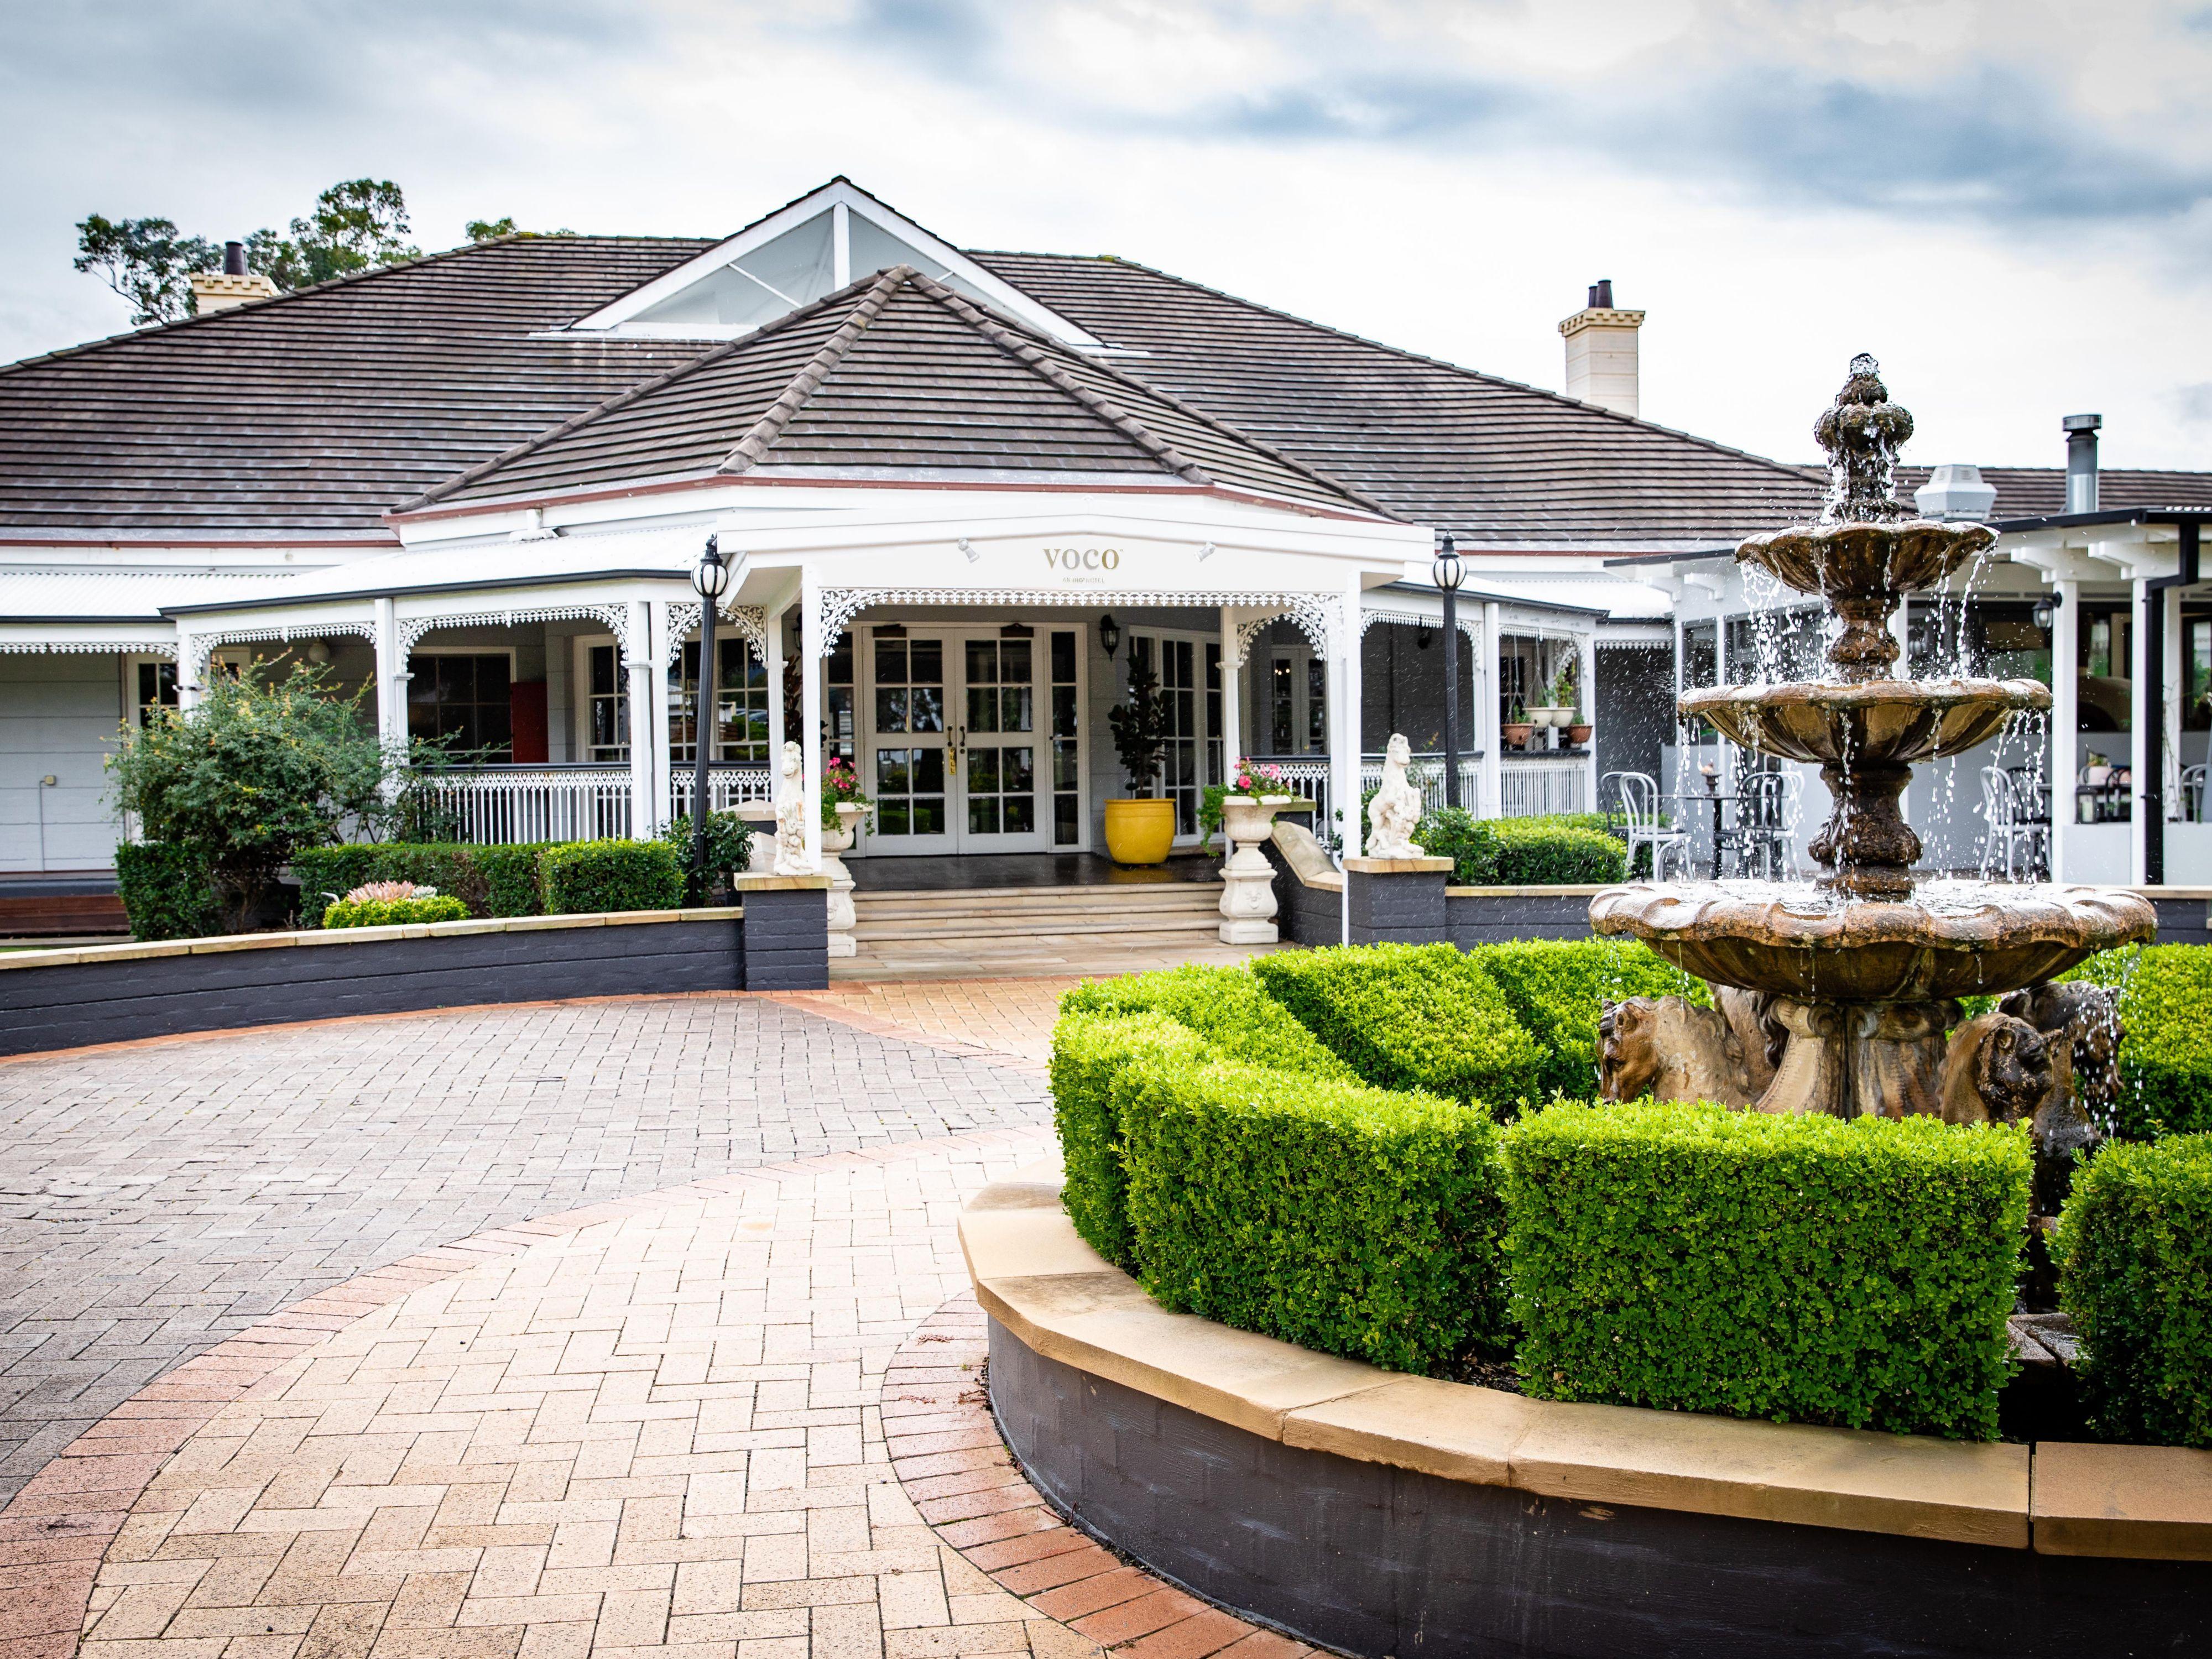 Find Newcastle Hotels | Top 3 Hotels in Newcastle, Australia